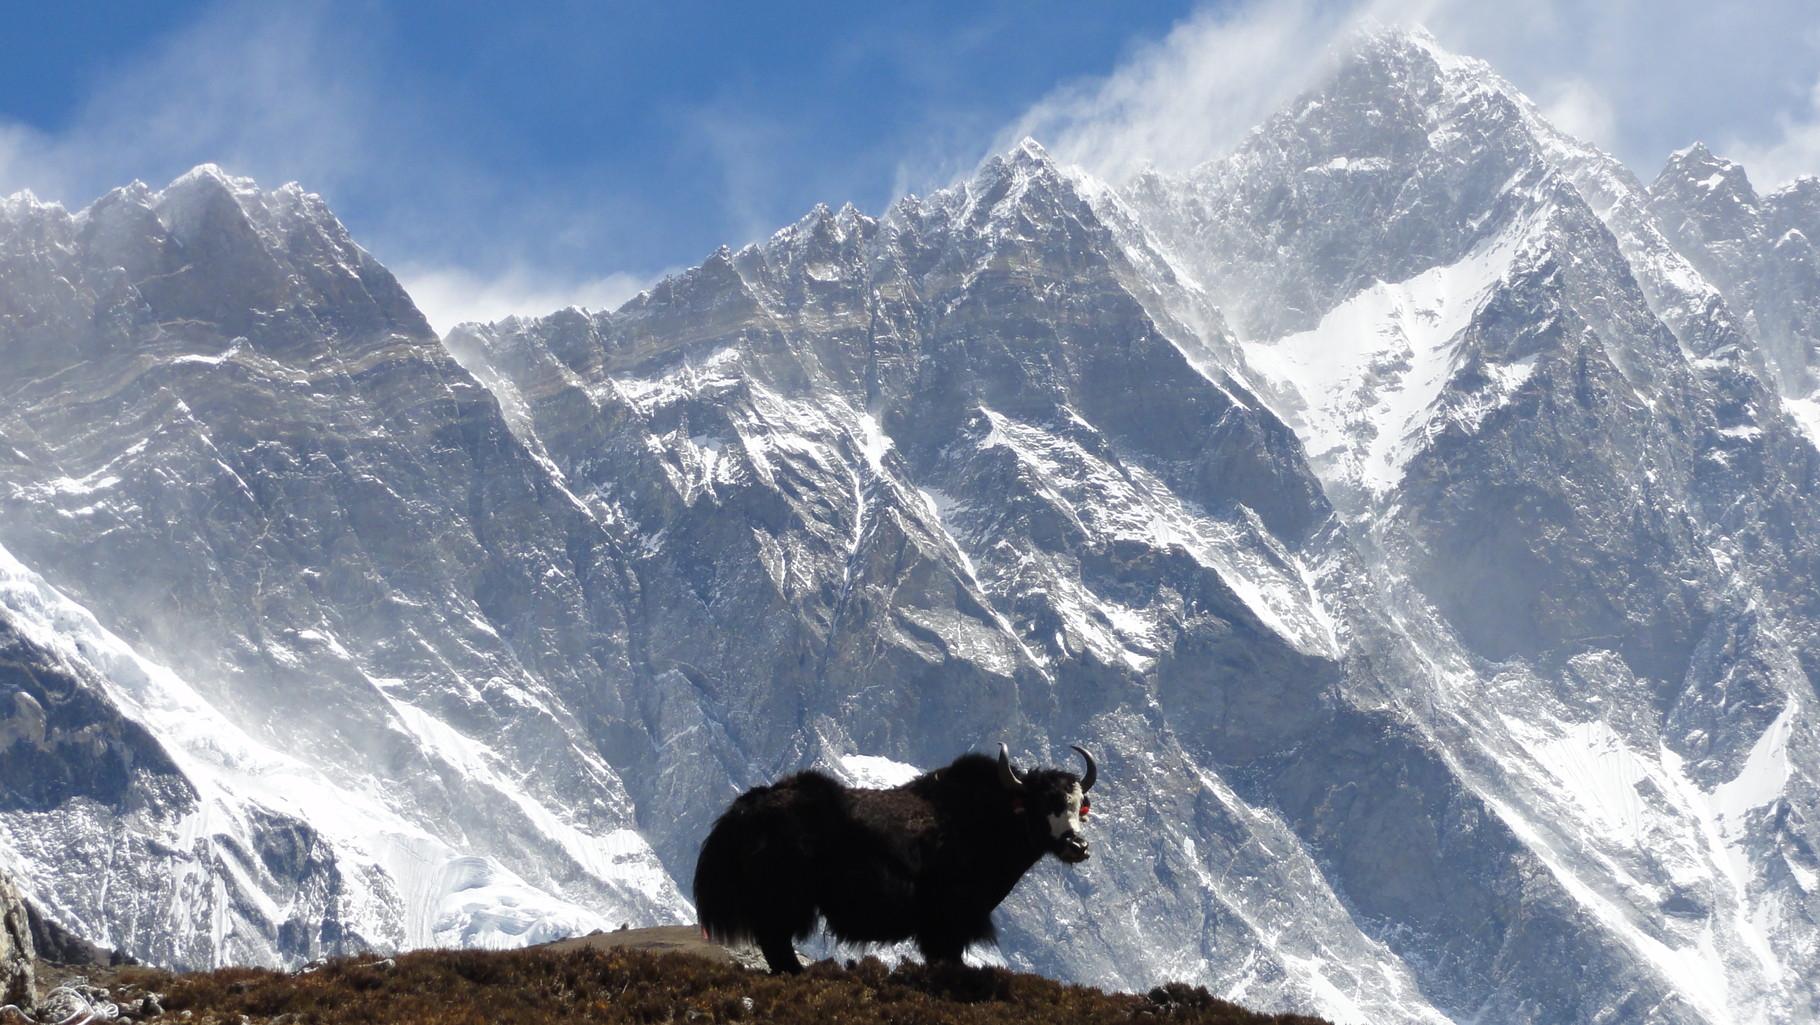 Yak vor Bergkulisse im Himalaya